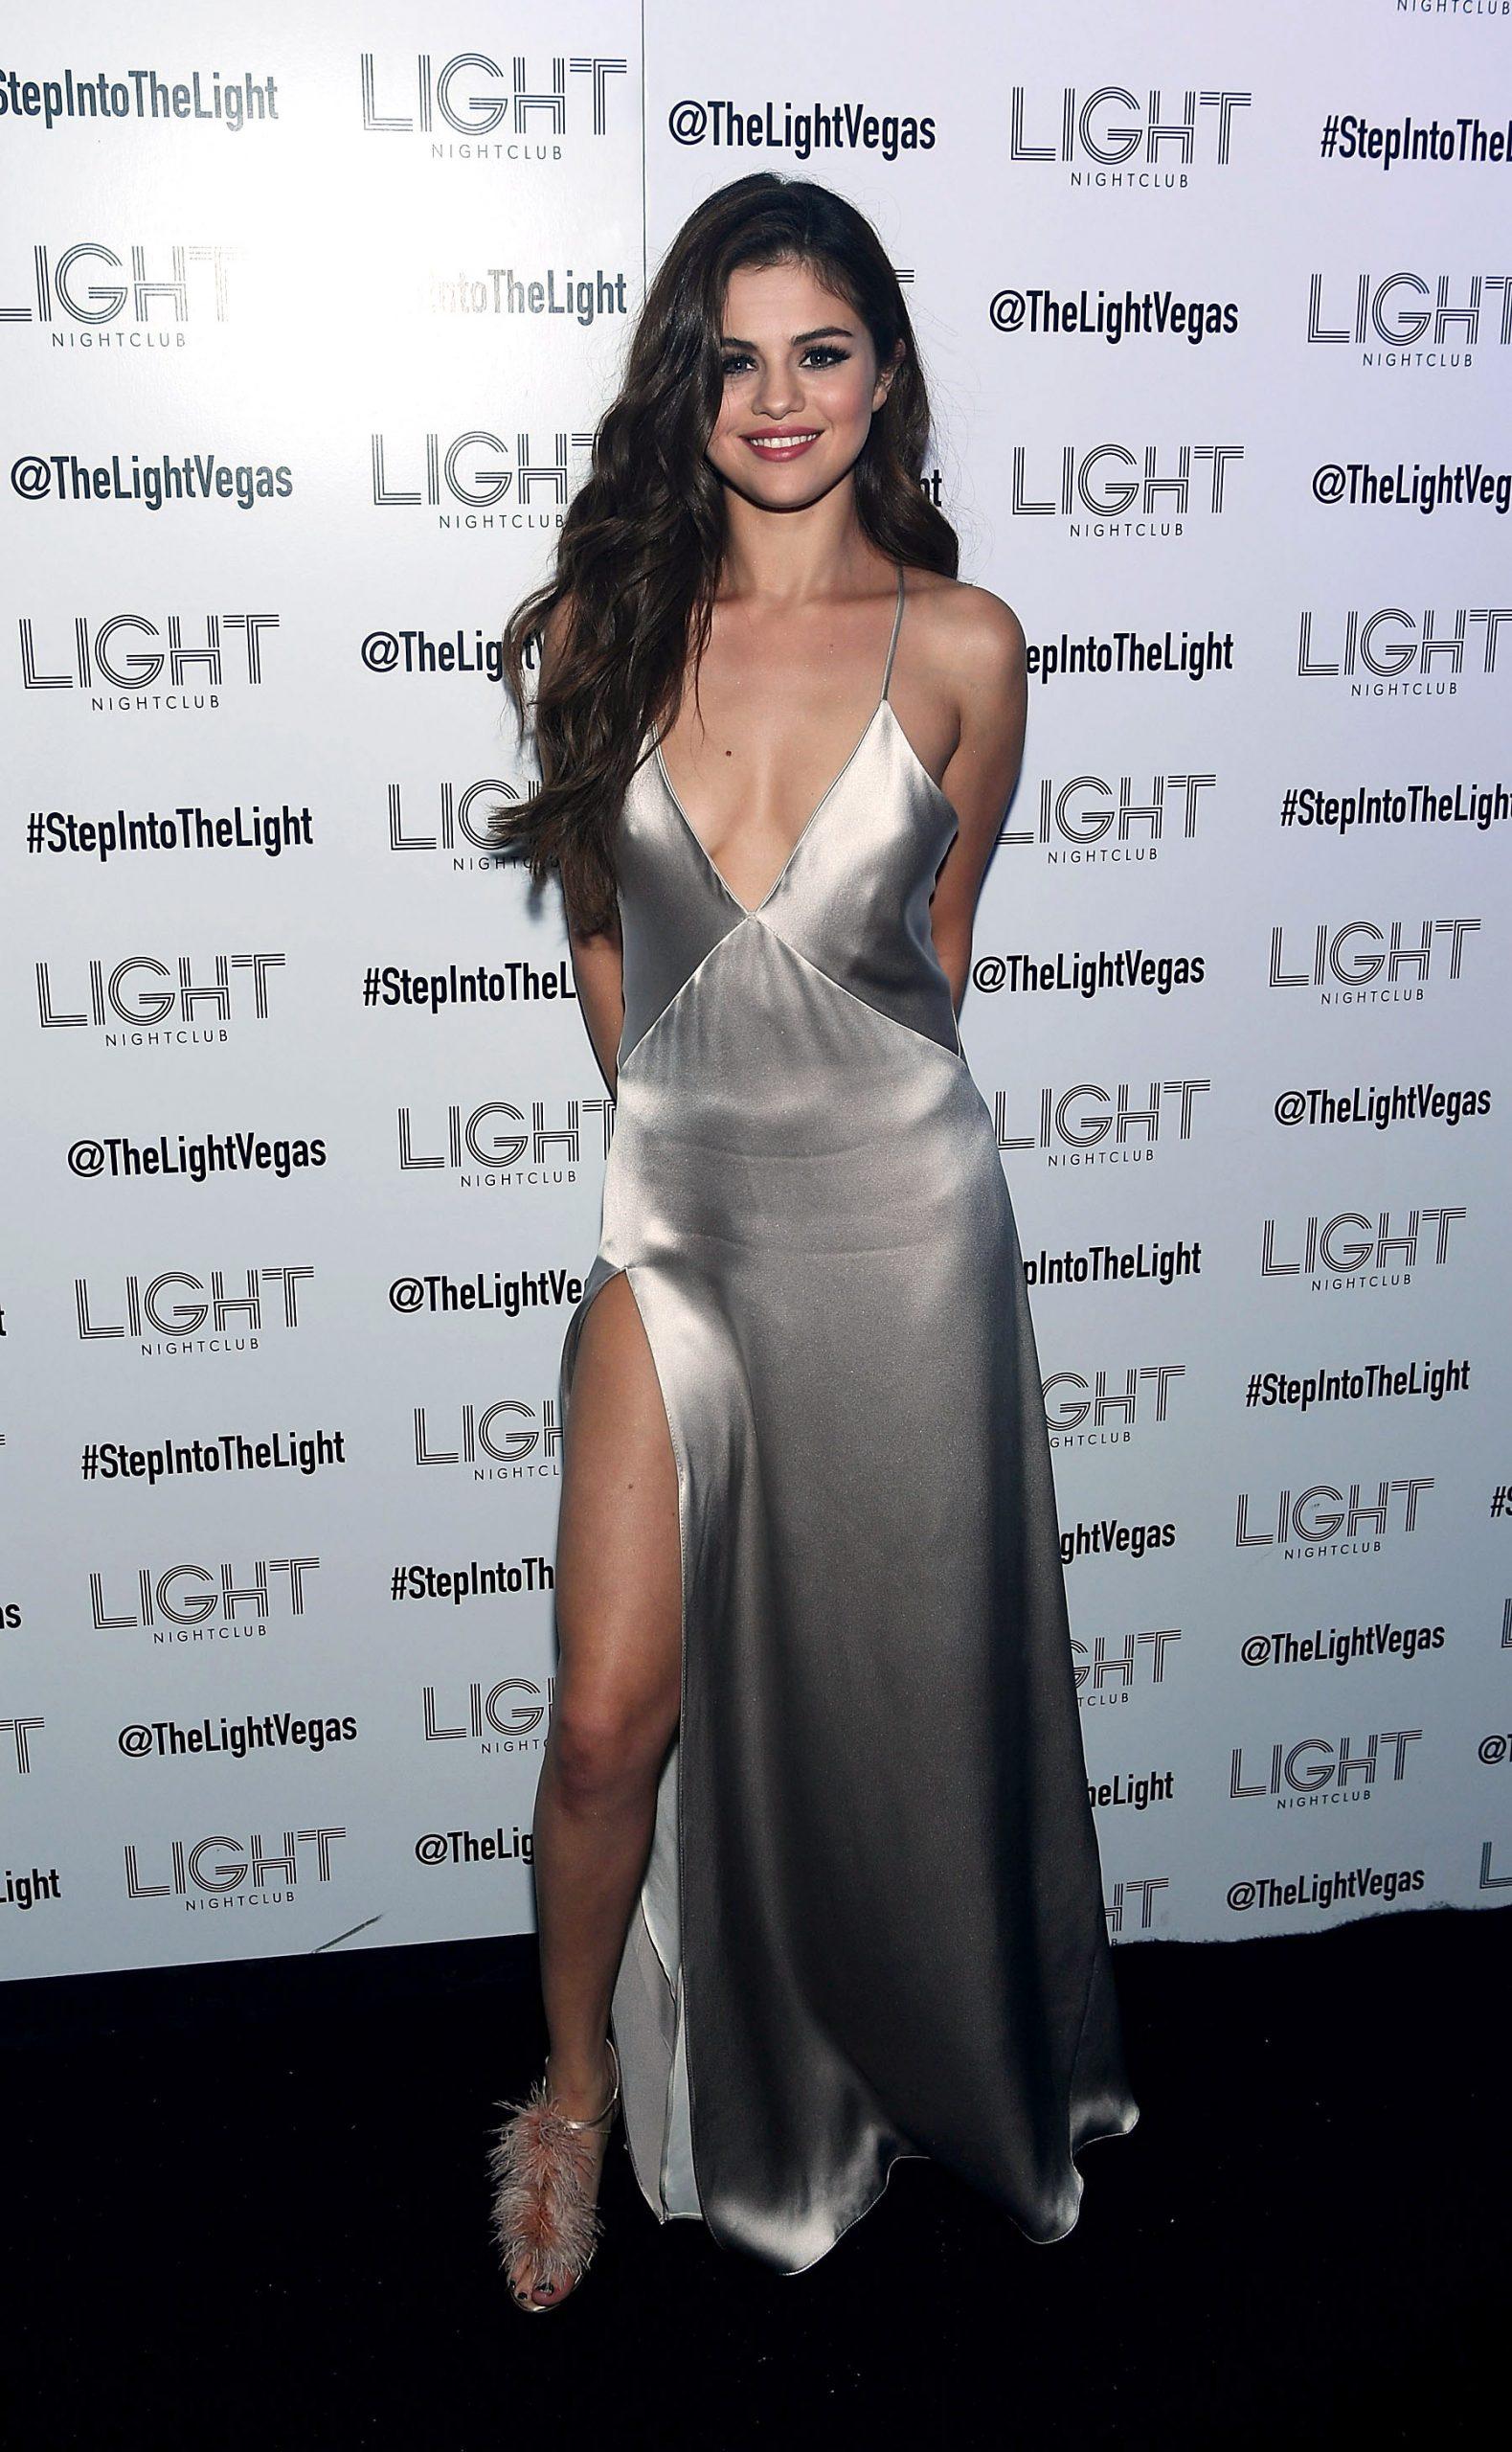 Dakota Johnson, Selena Gomez To Millie Bobby Brown – Satin Dress Inspirations For New Year's Night!